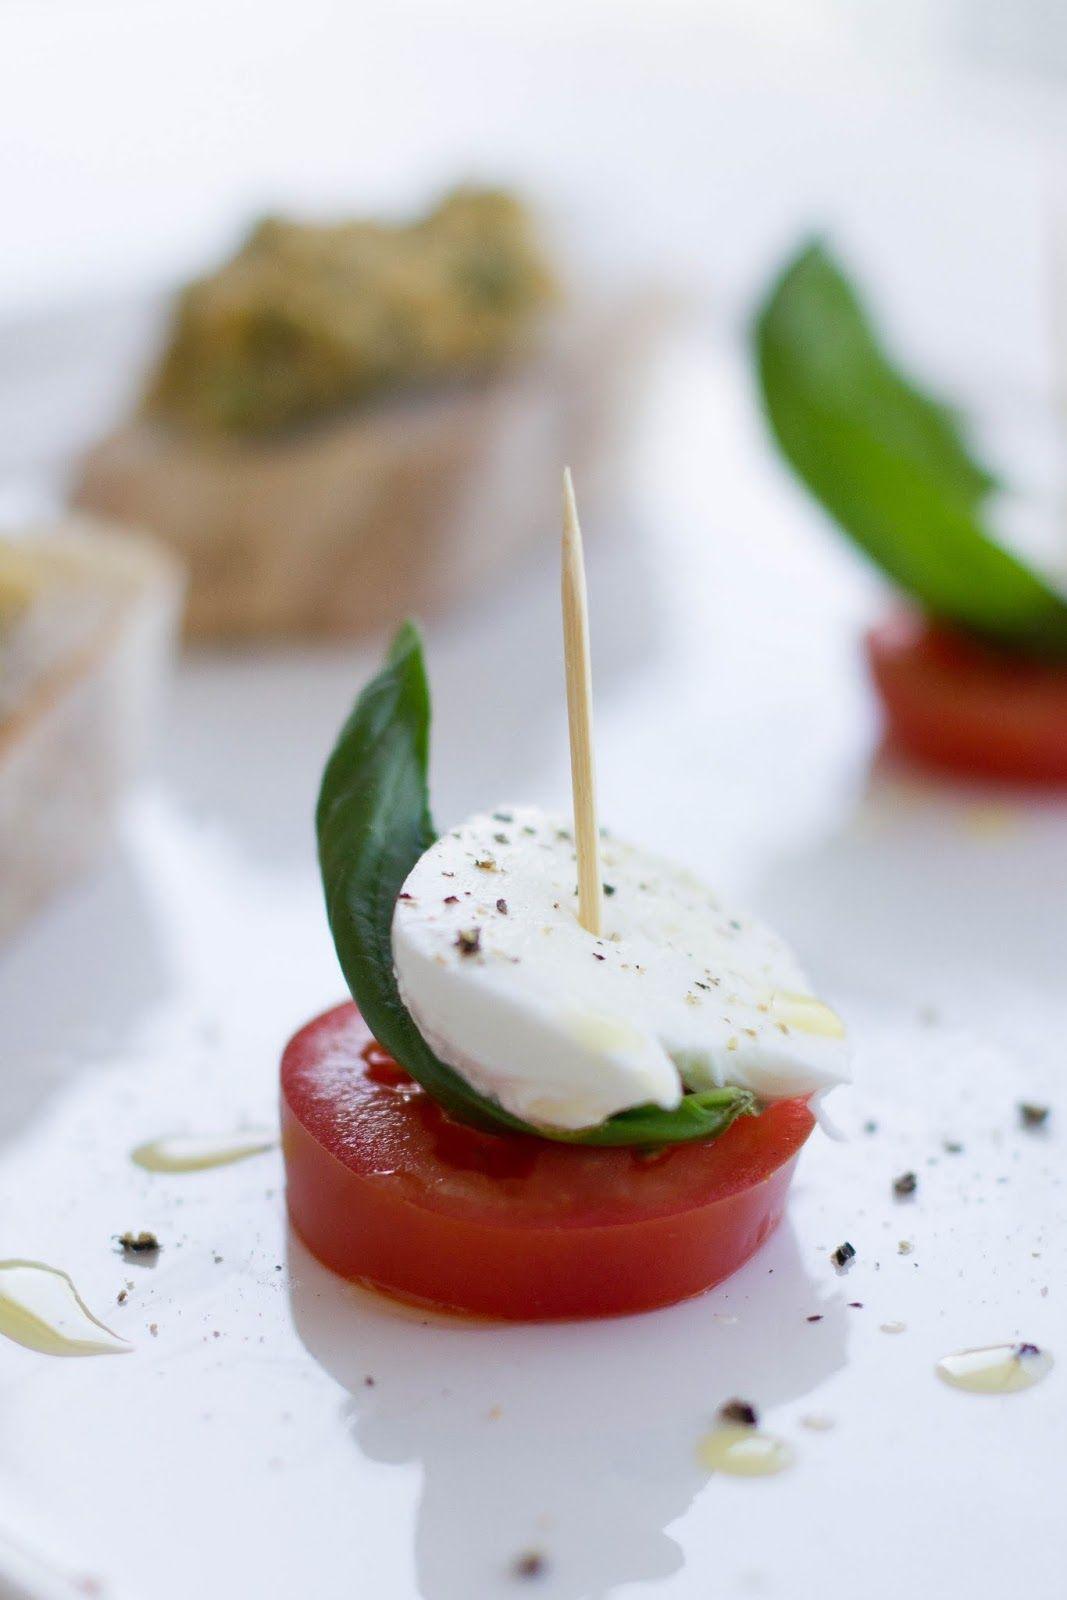 Caprese Stack: http://44cookhamroad.blogspot.sg/2013/02/polpo-venetian-cookbook-of-sorts-brings_9.html